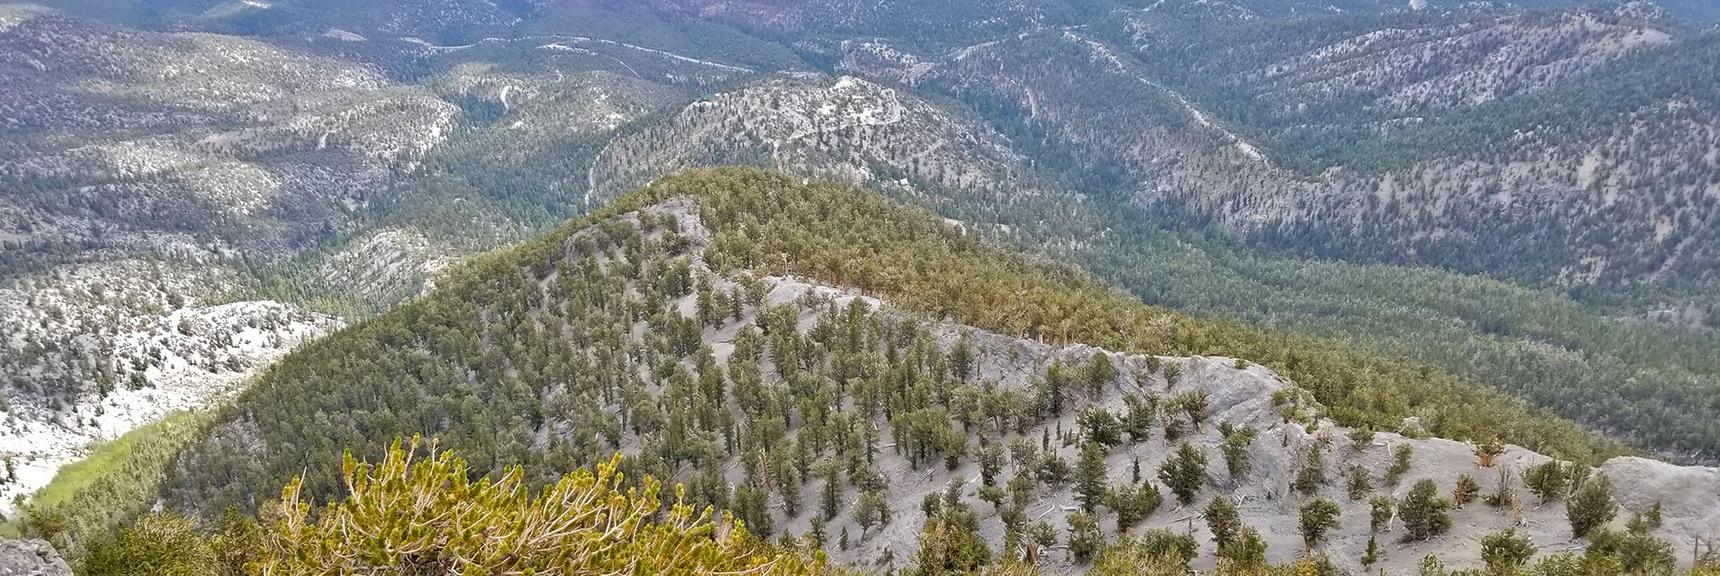 Viewing a Potential Approach Ridge Below Mummy Mt. Eastern Cliffs   Mummy Mountain Northern Rim Overlook, Spring Mountain Wilderness, Nevada